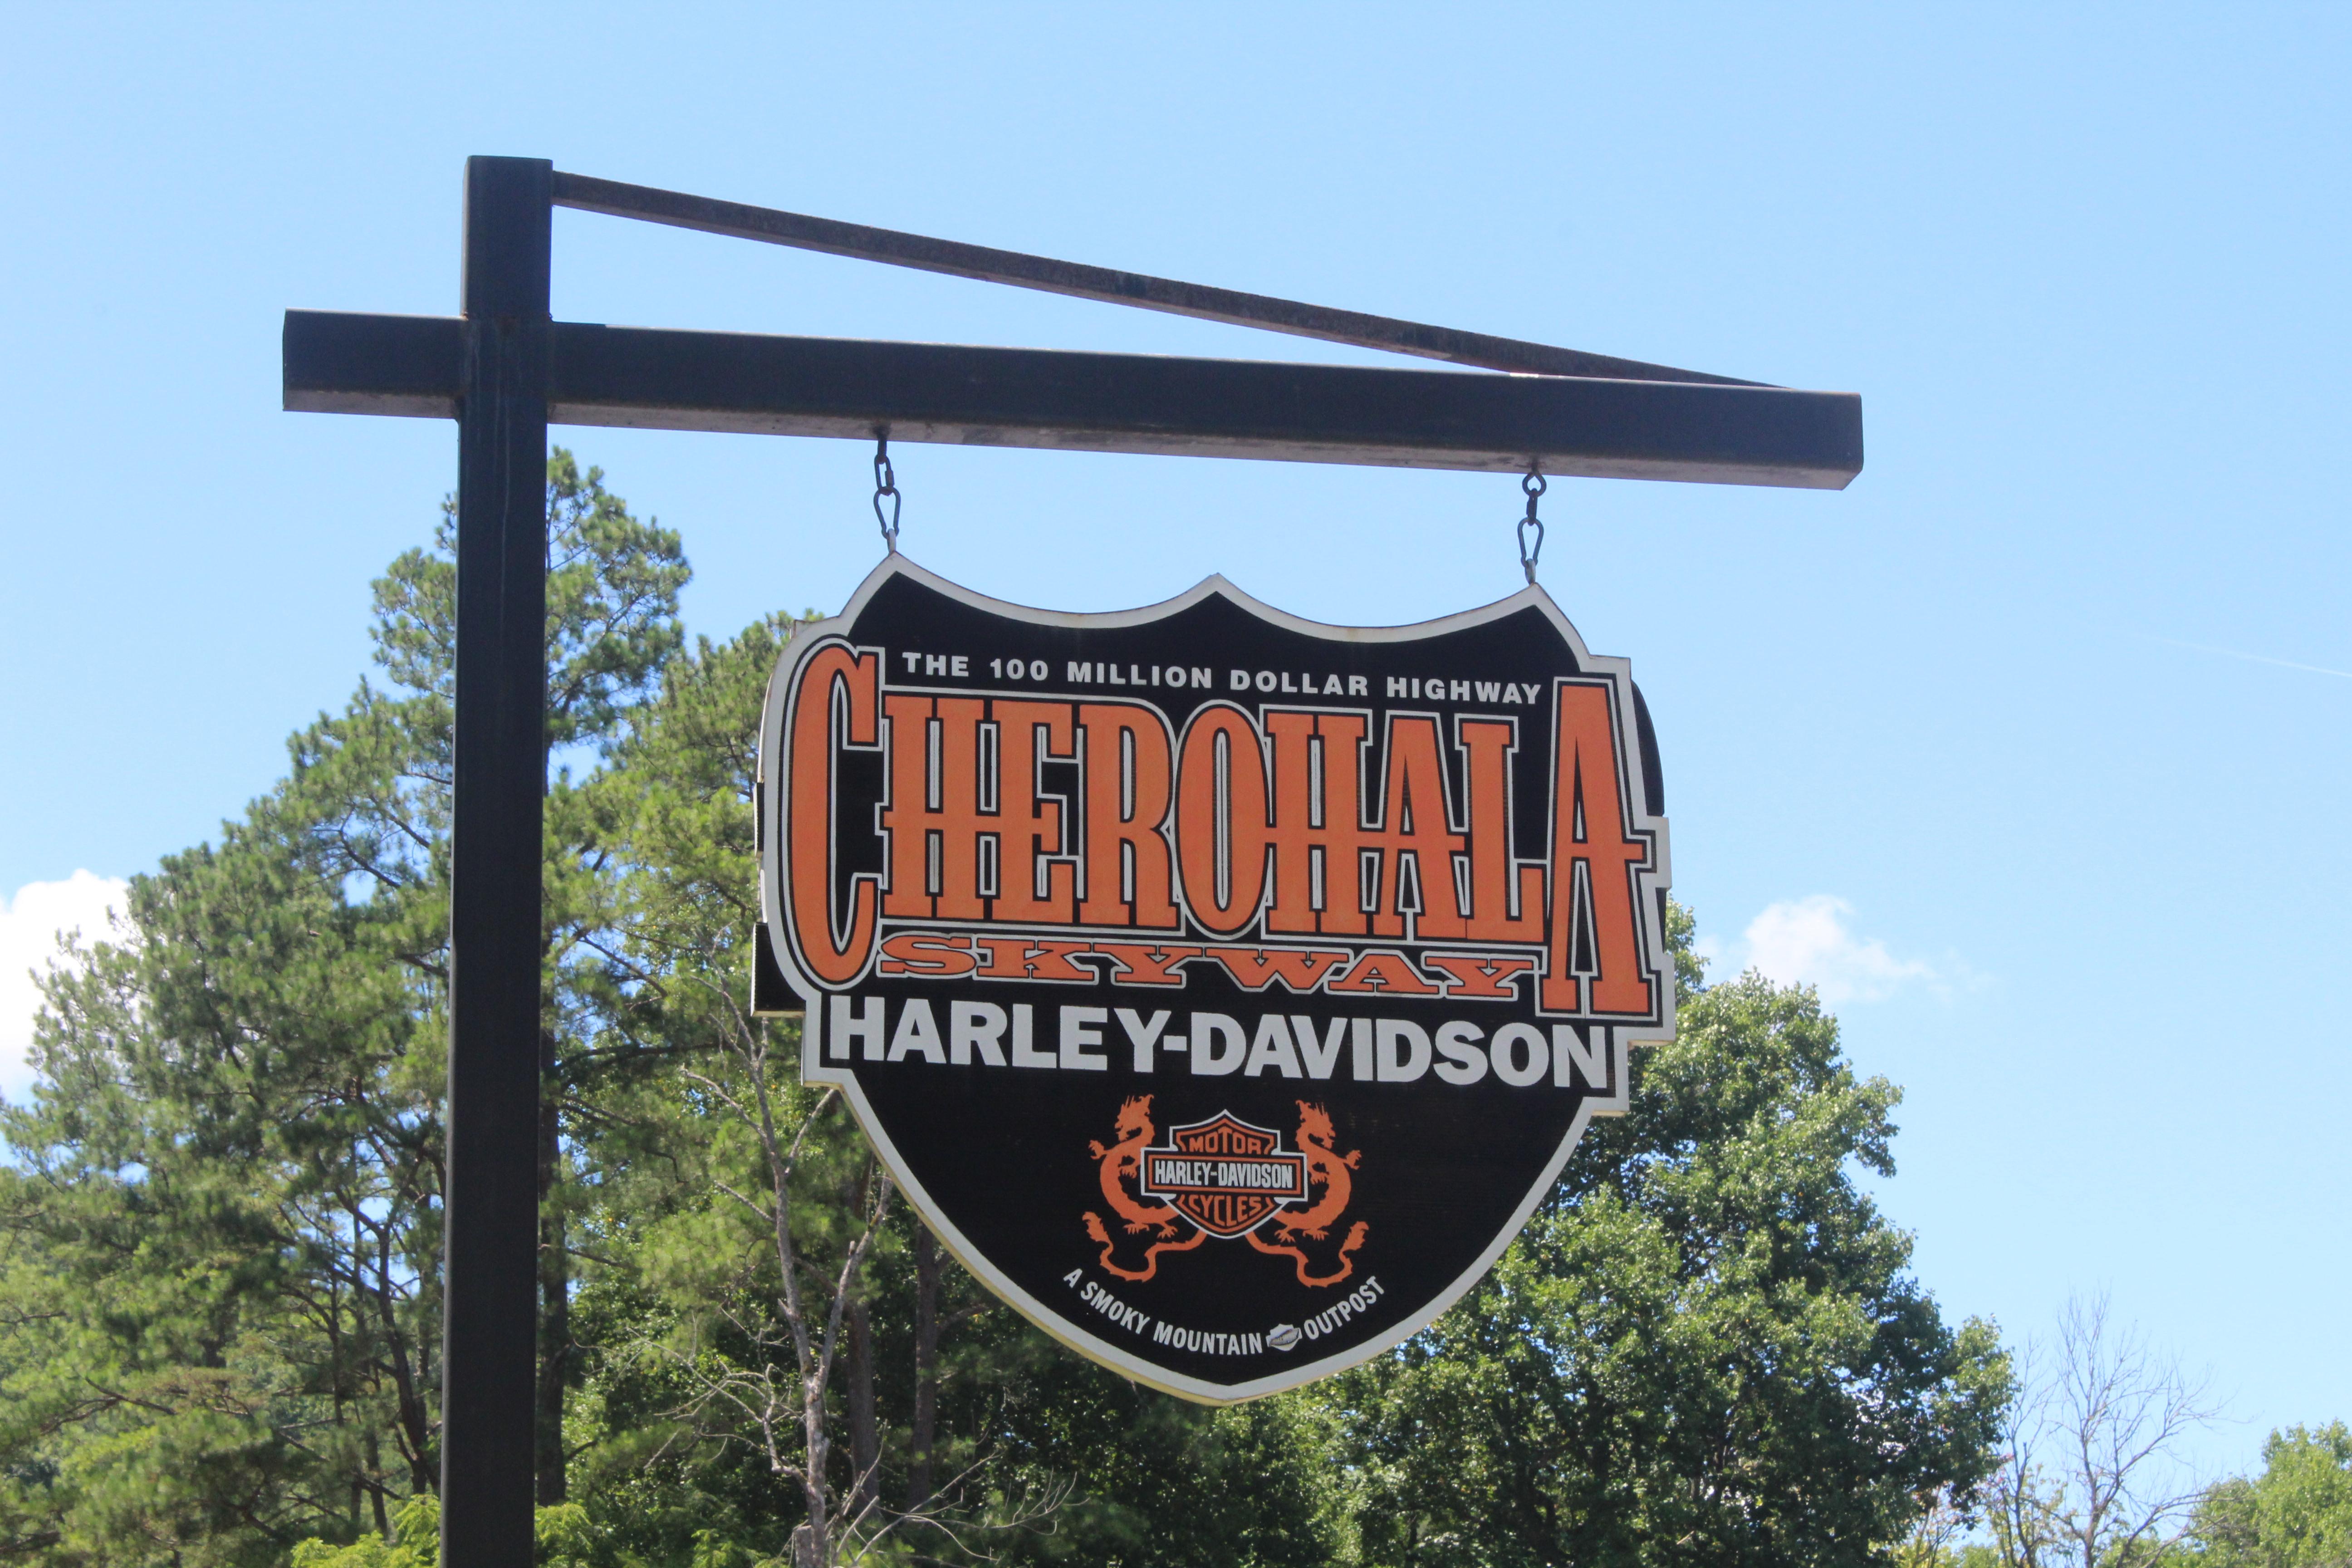 Cherohala Harley Davidson Store